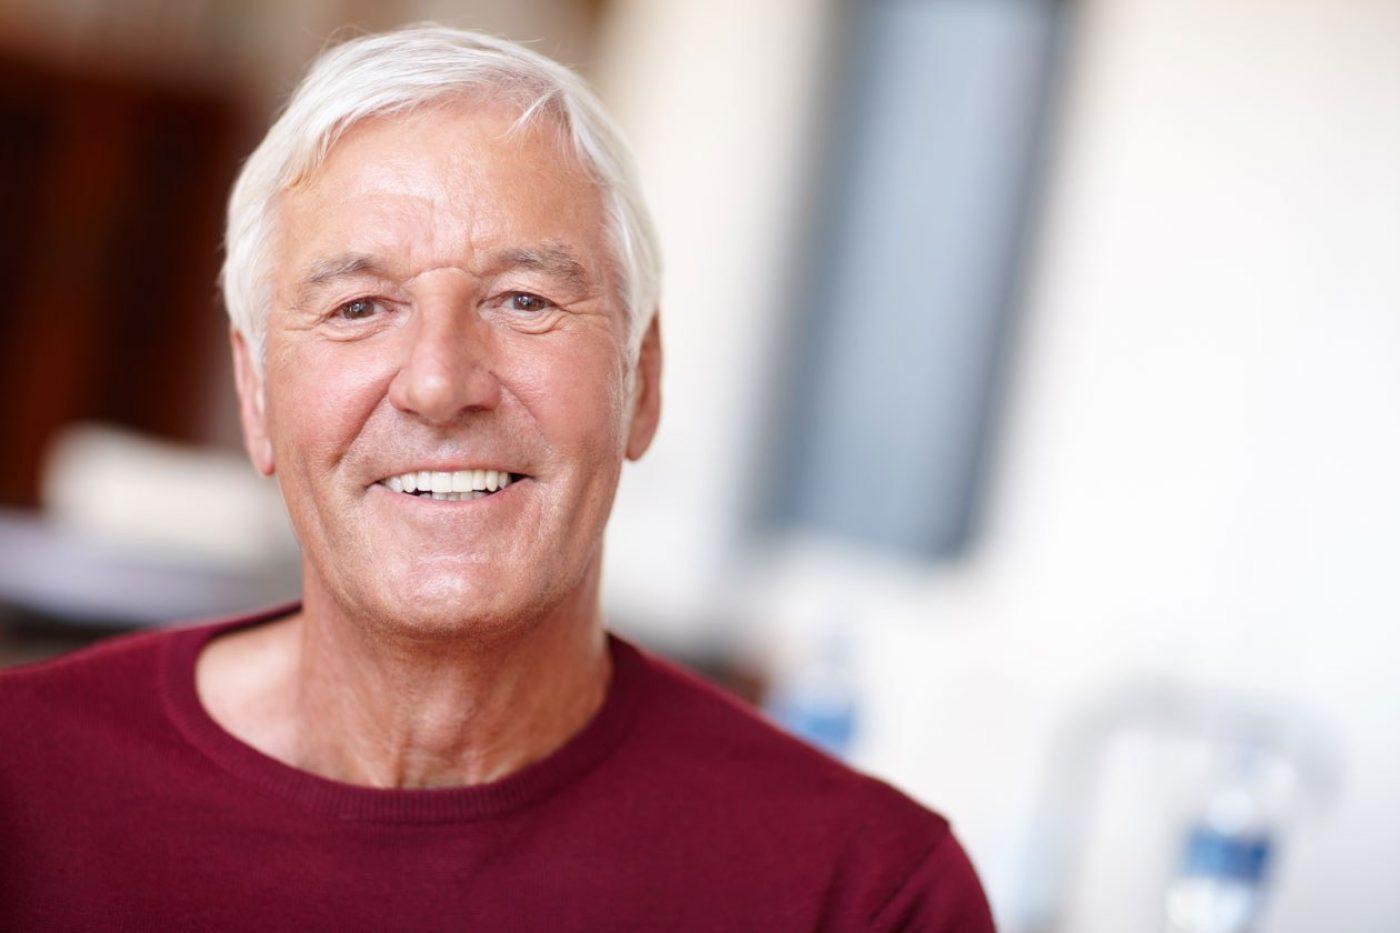 Whitby Dental Dental Implants